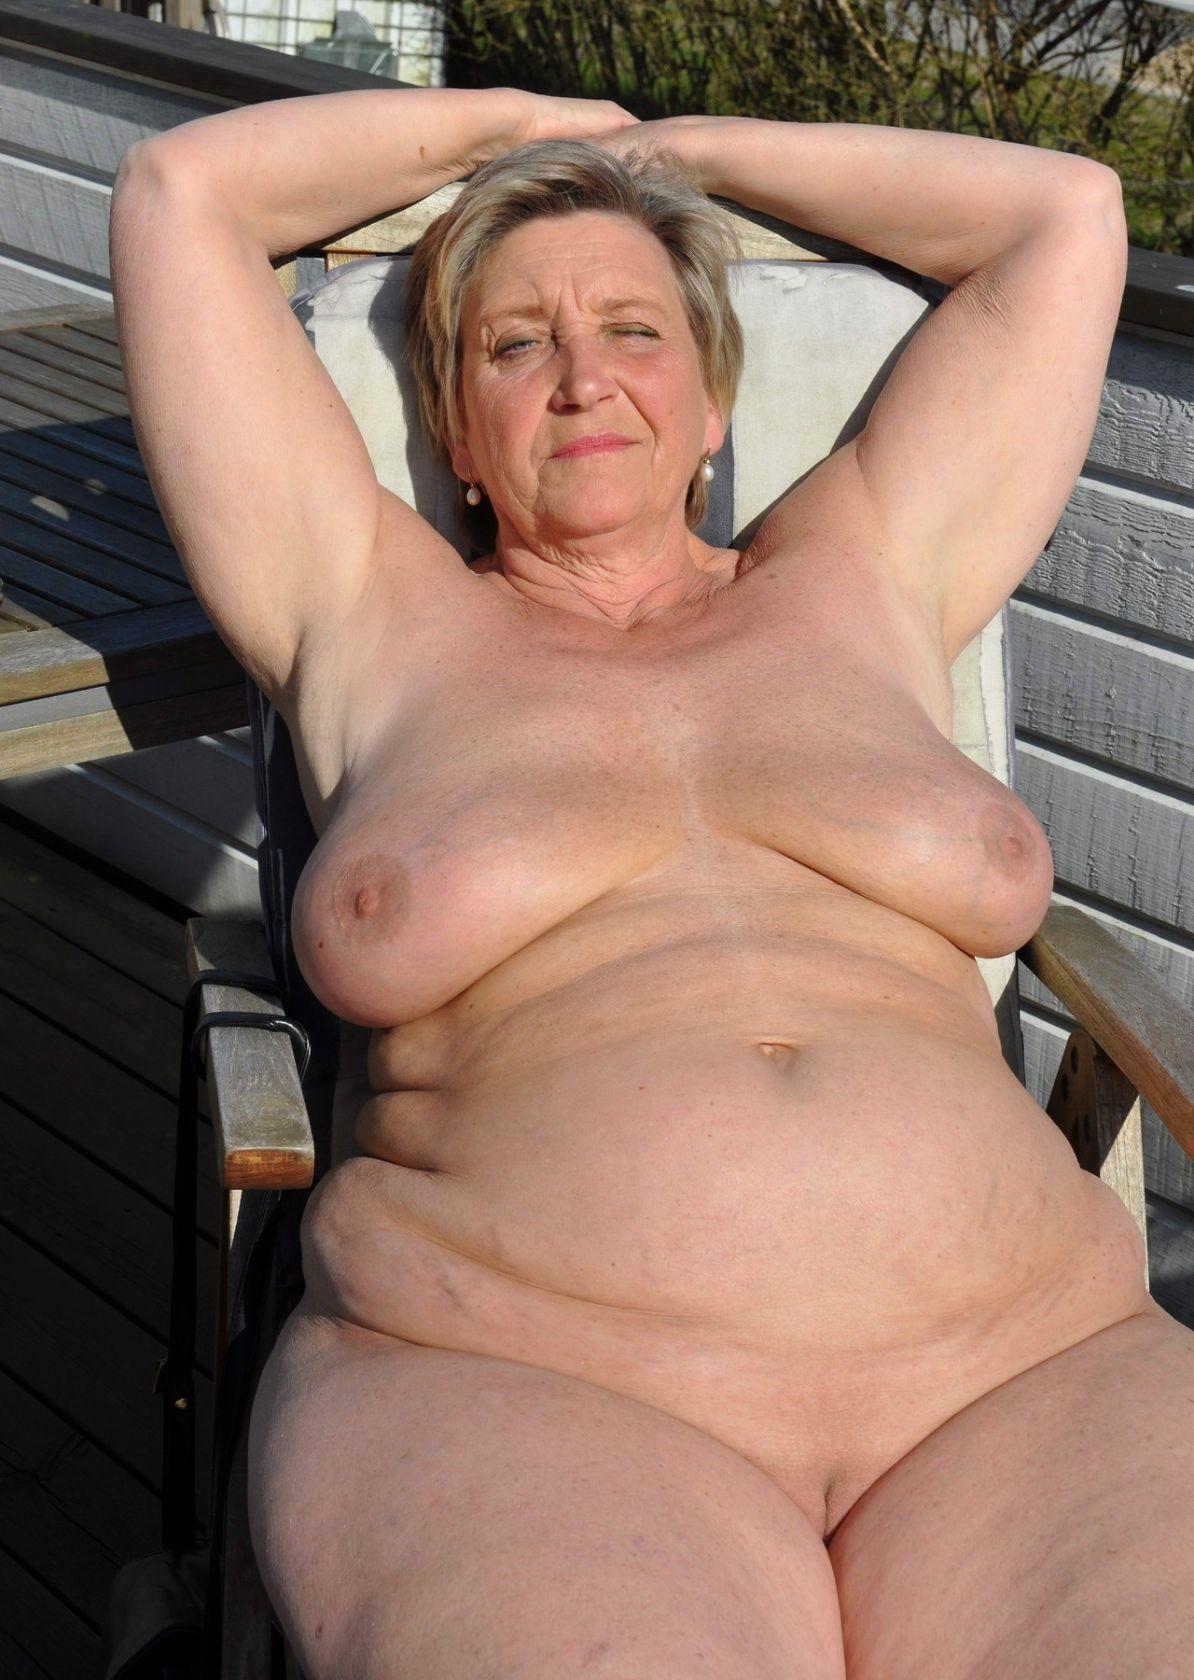 Imani a divorced granny has an enjoyable and very fuckable chubby bbw body